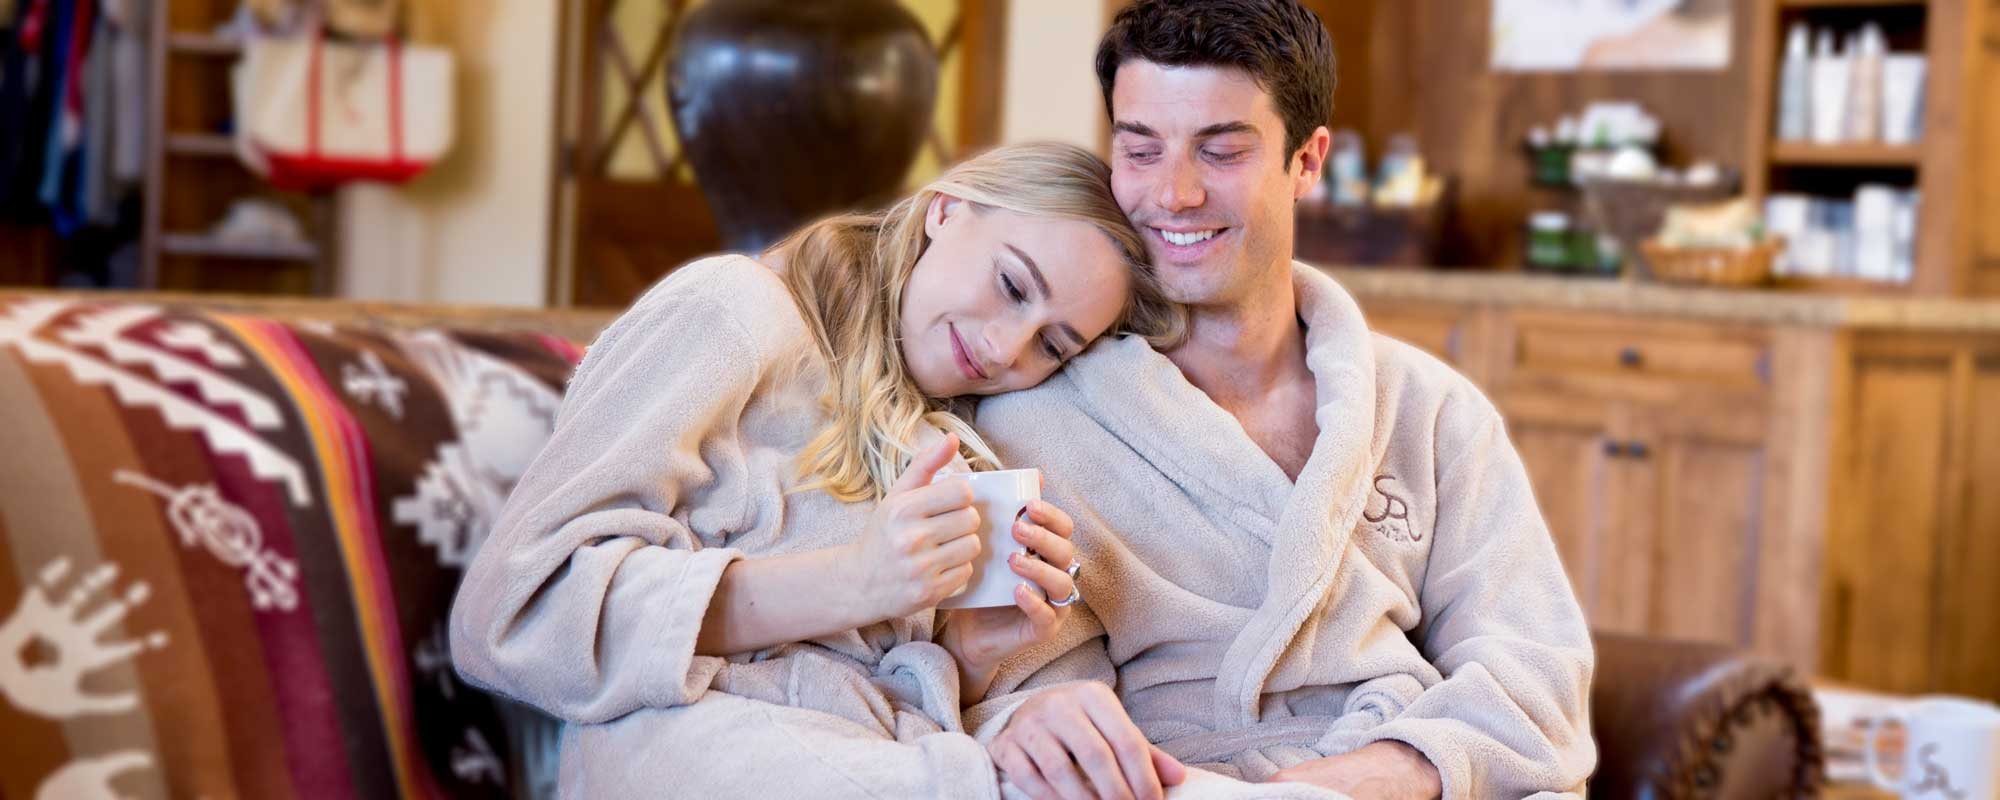 A Couple enjoying a romantic spa getaway at the Alisal Guest Ranch & Resort